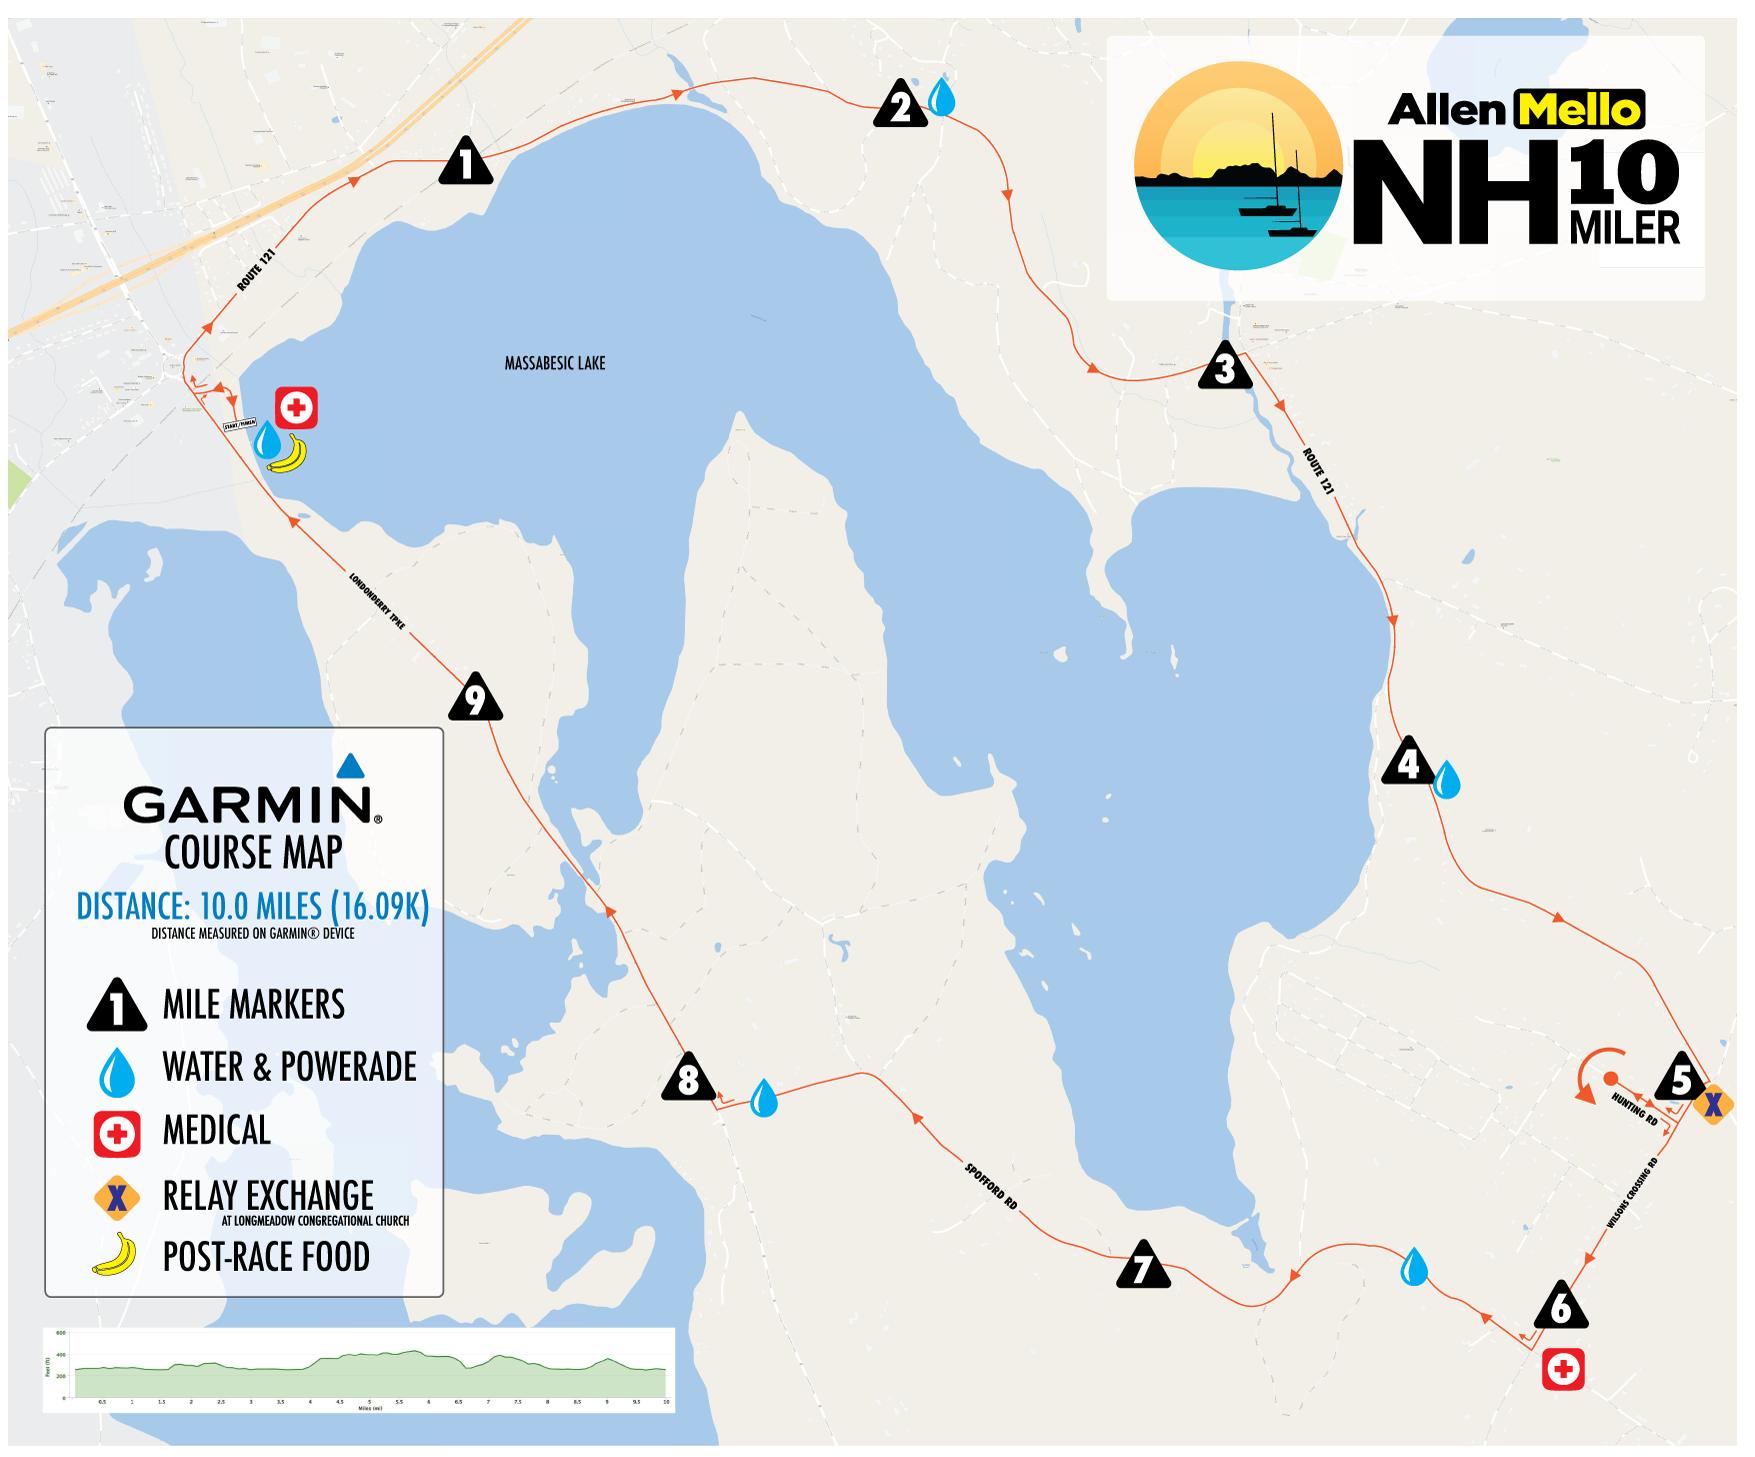 Allen Mello NH 10 Miler - MillenniumRunning.com on interstate 95 map, nh highway map, route 2 map,